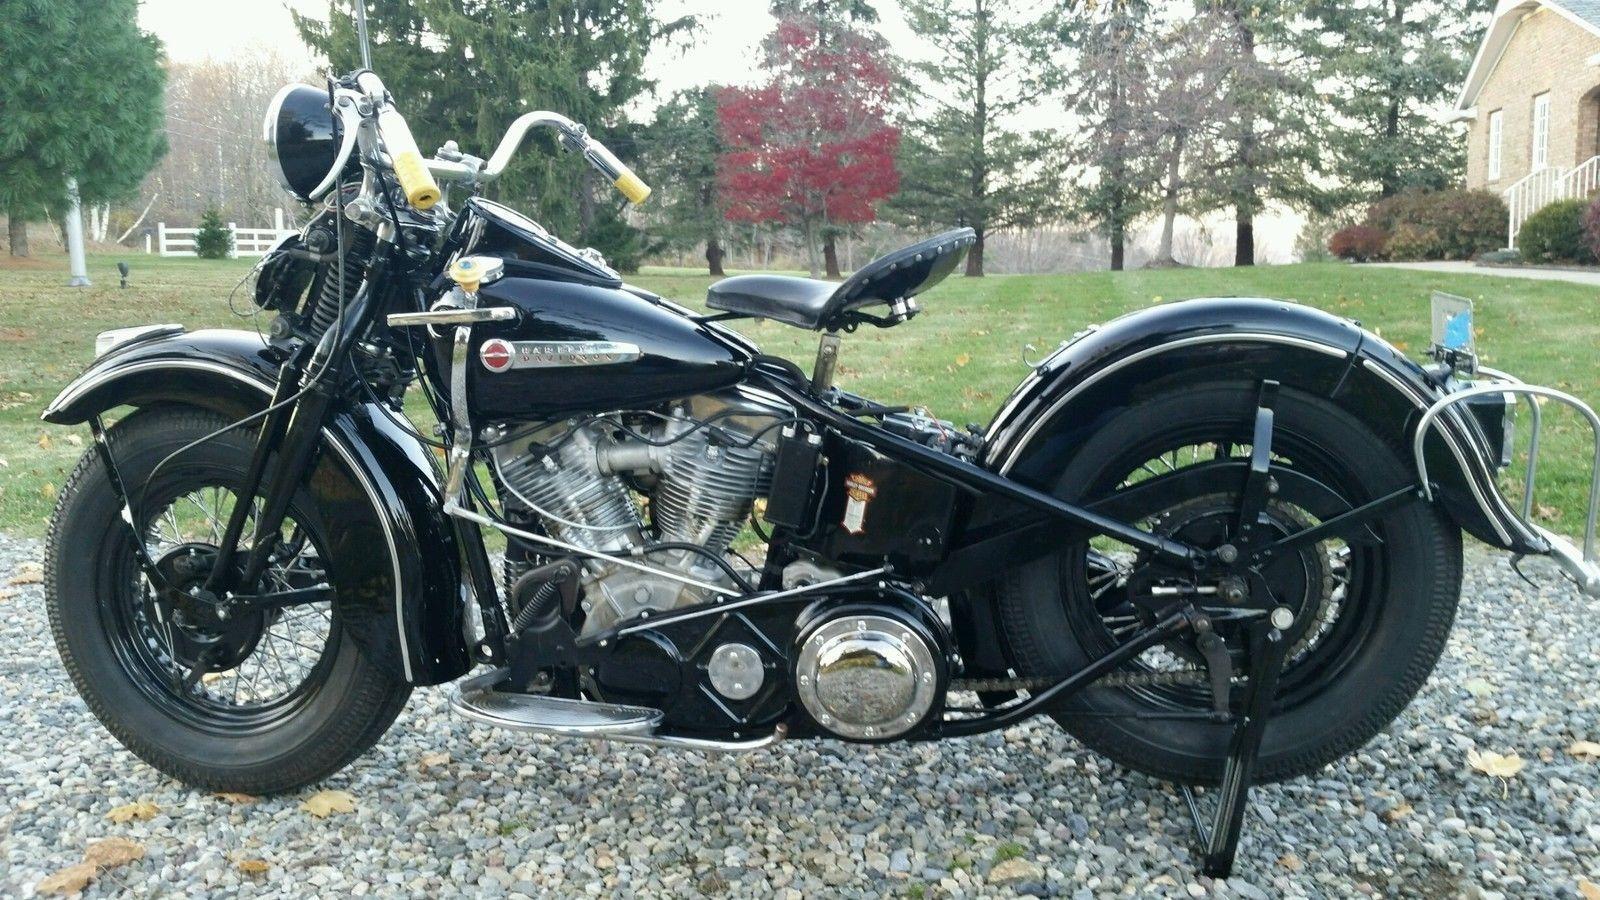 1948 Harley Davidson El Panhead Classic Harley Davidson Harley Davidson Panhead Harley Davidson Motorcycles